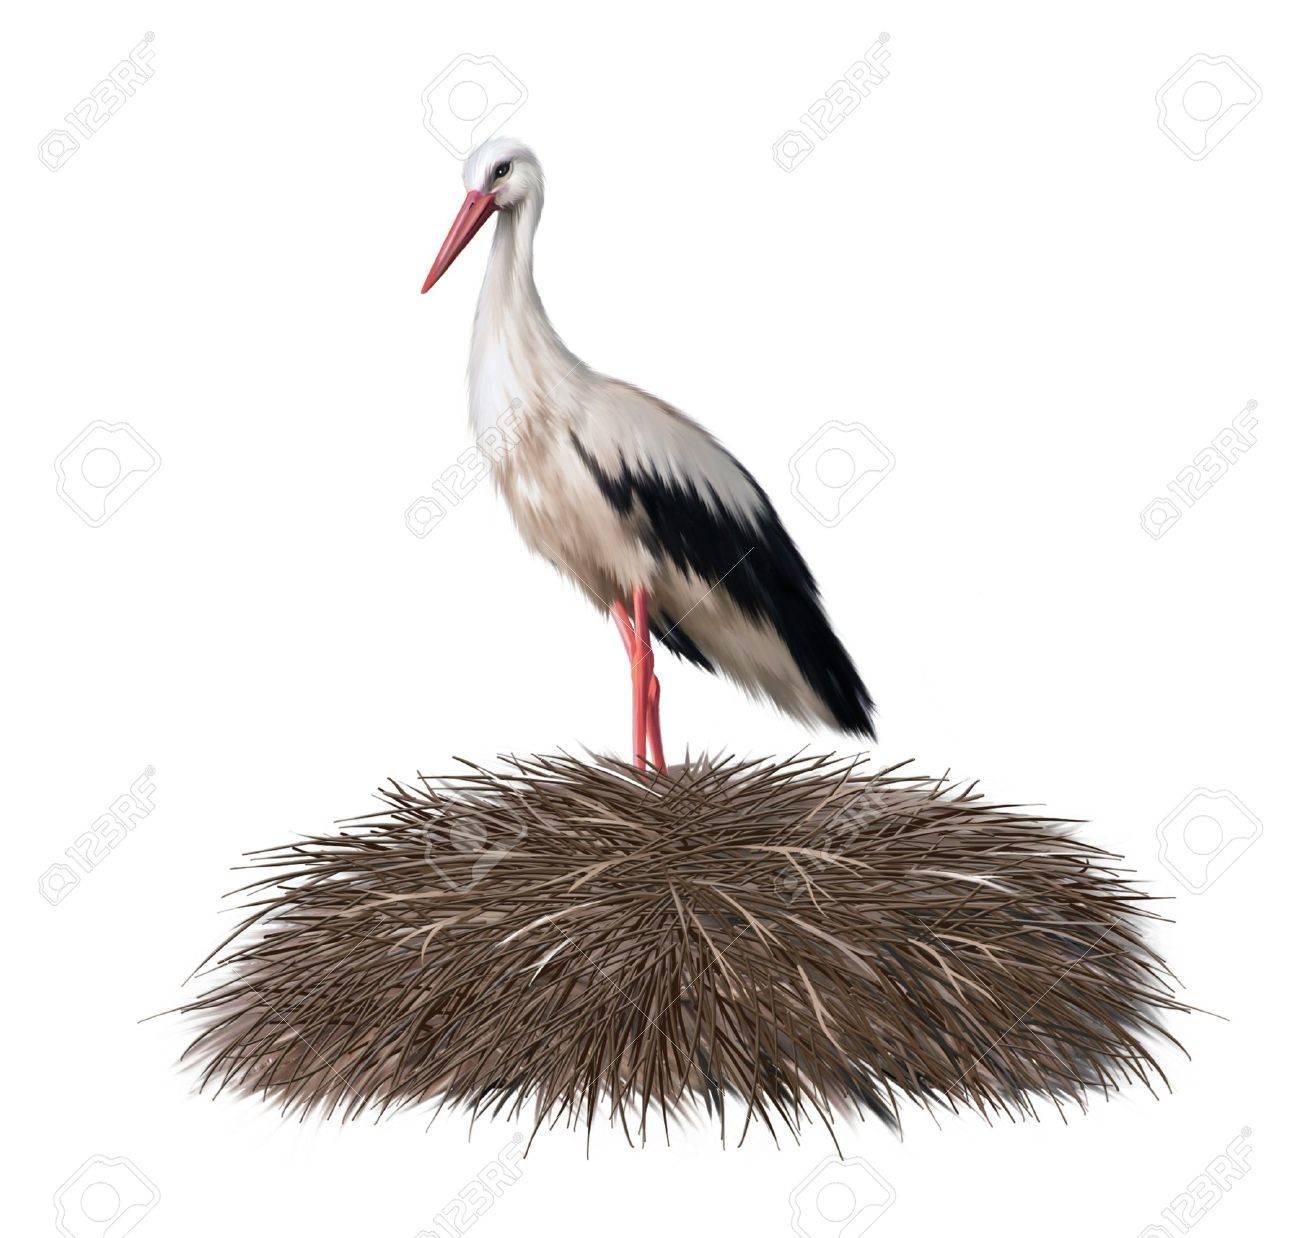 Adult stork standing in its nest  Spring Standard-Bild - 18411616